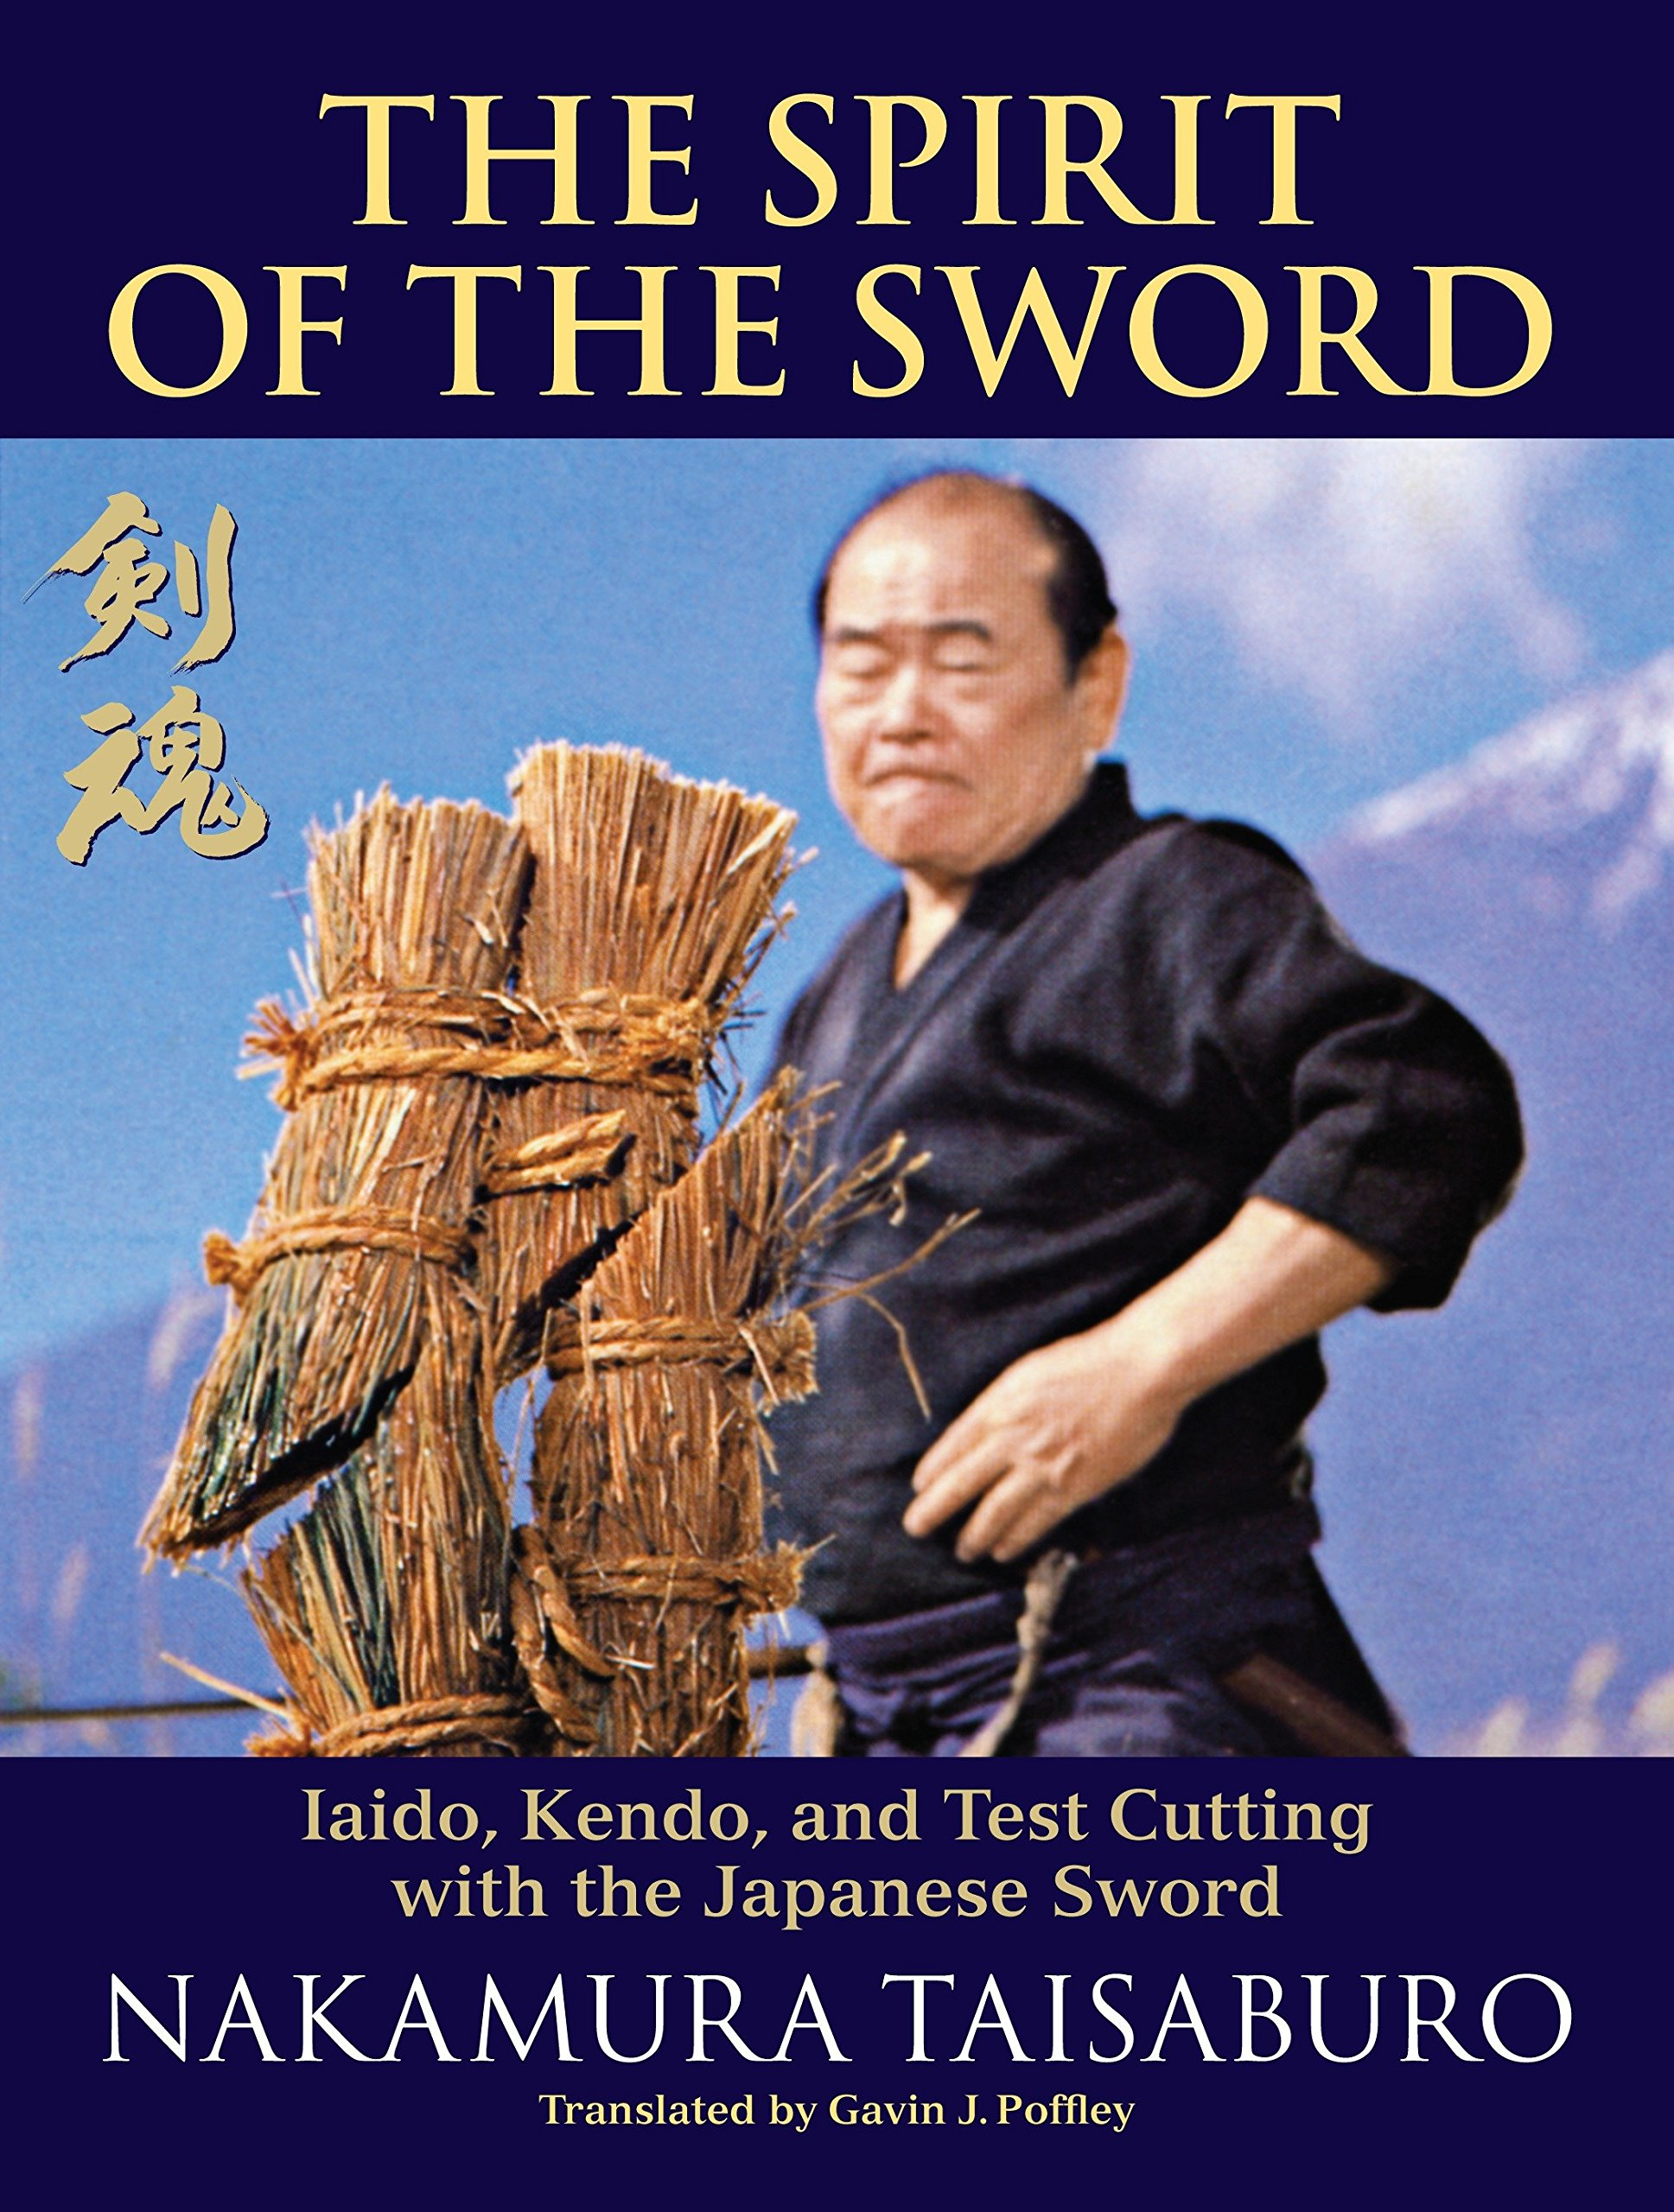 Japanese Sword Kendo Arts 2 7 Iaido Iai do Book Traditional Method Philosophy